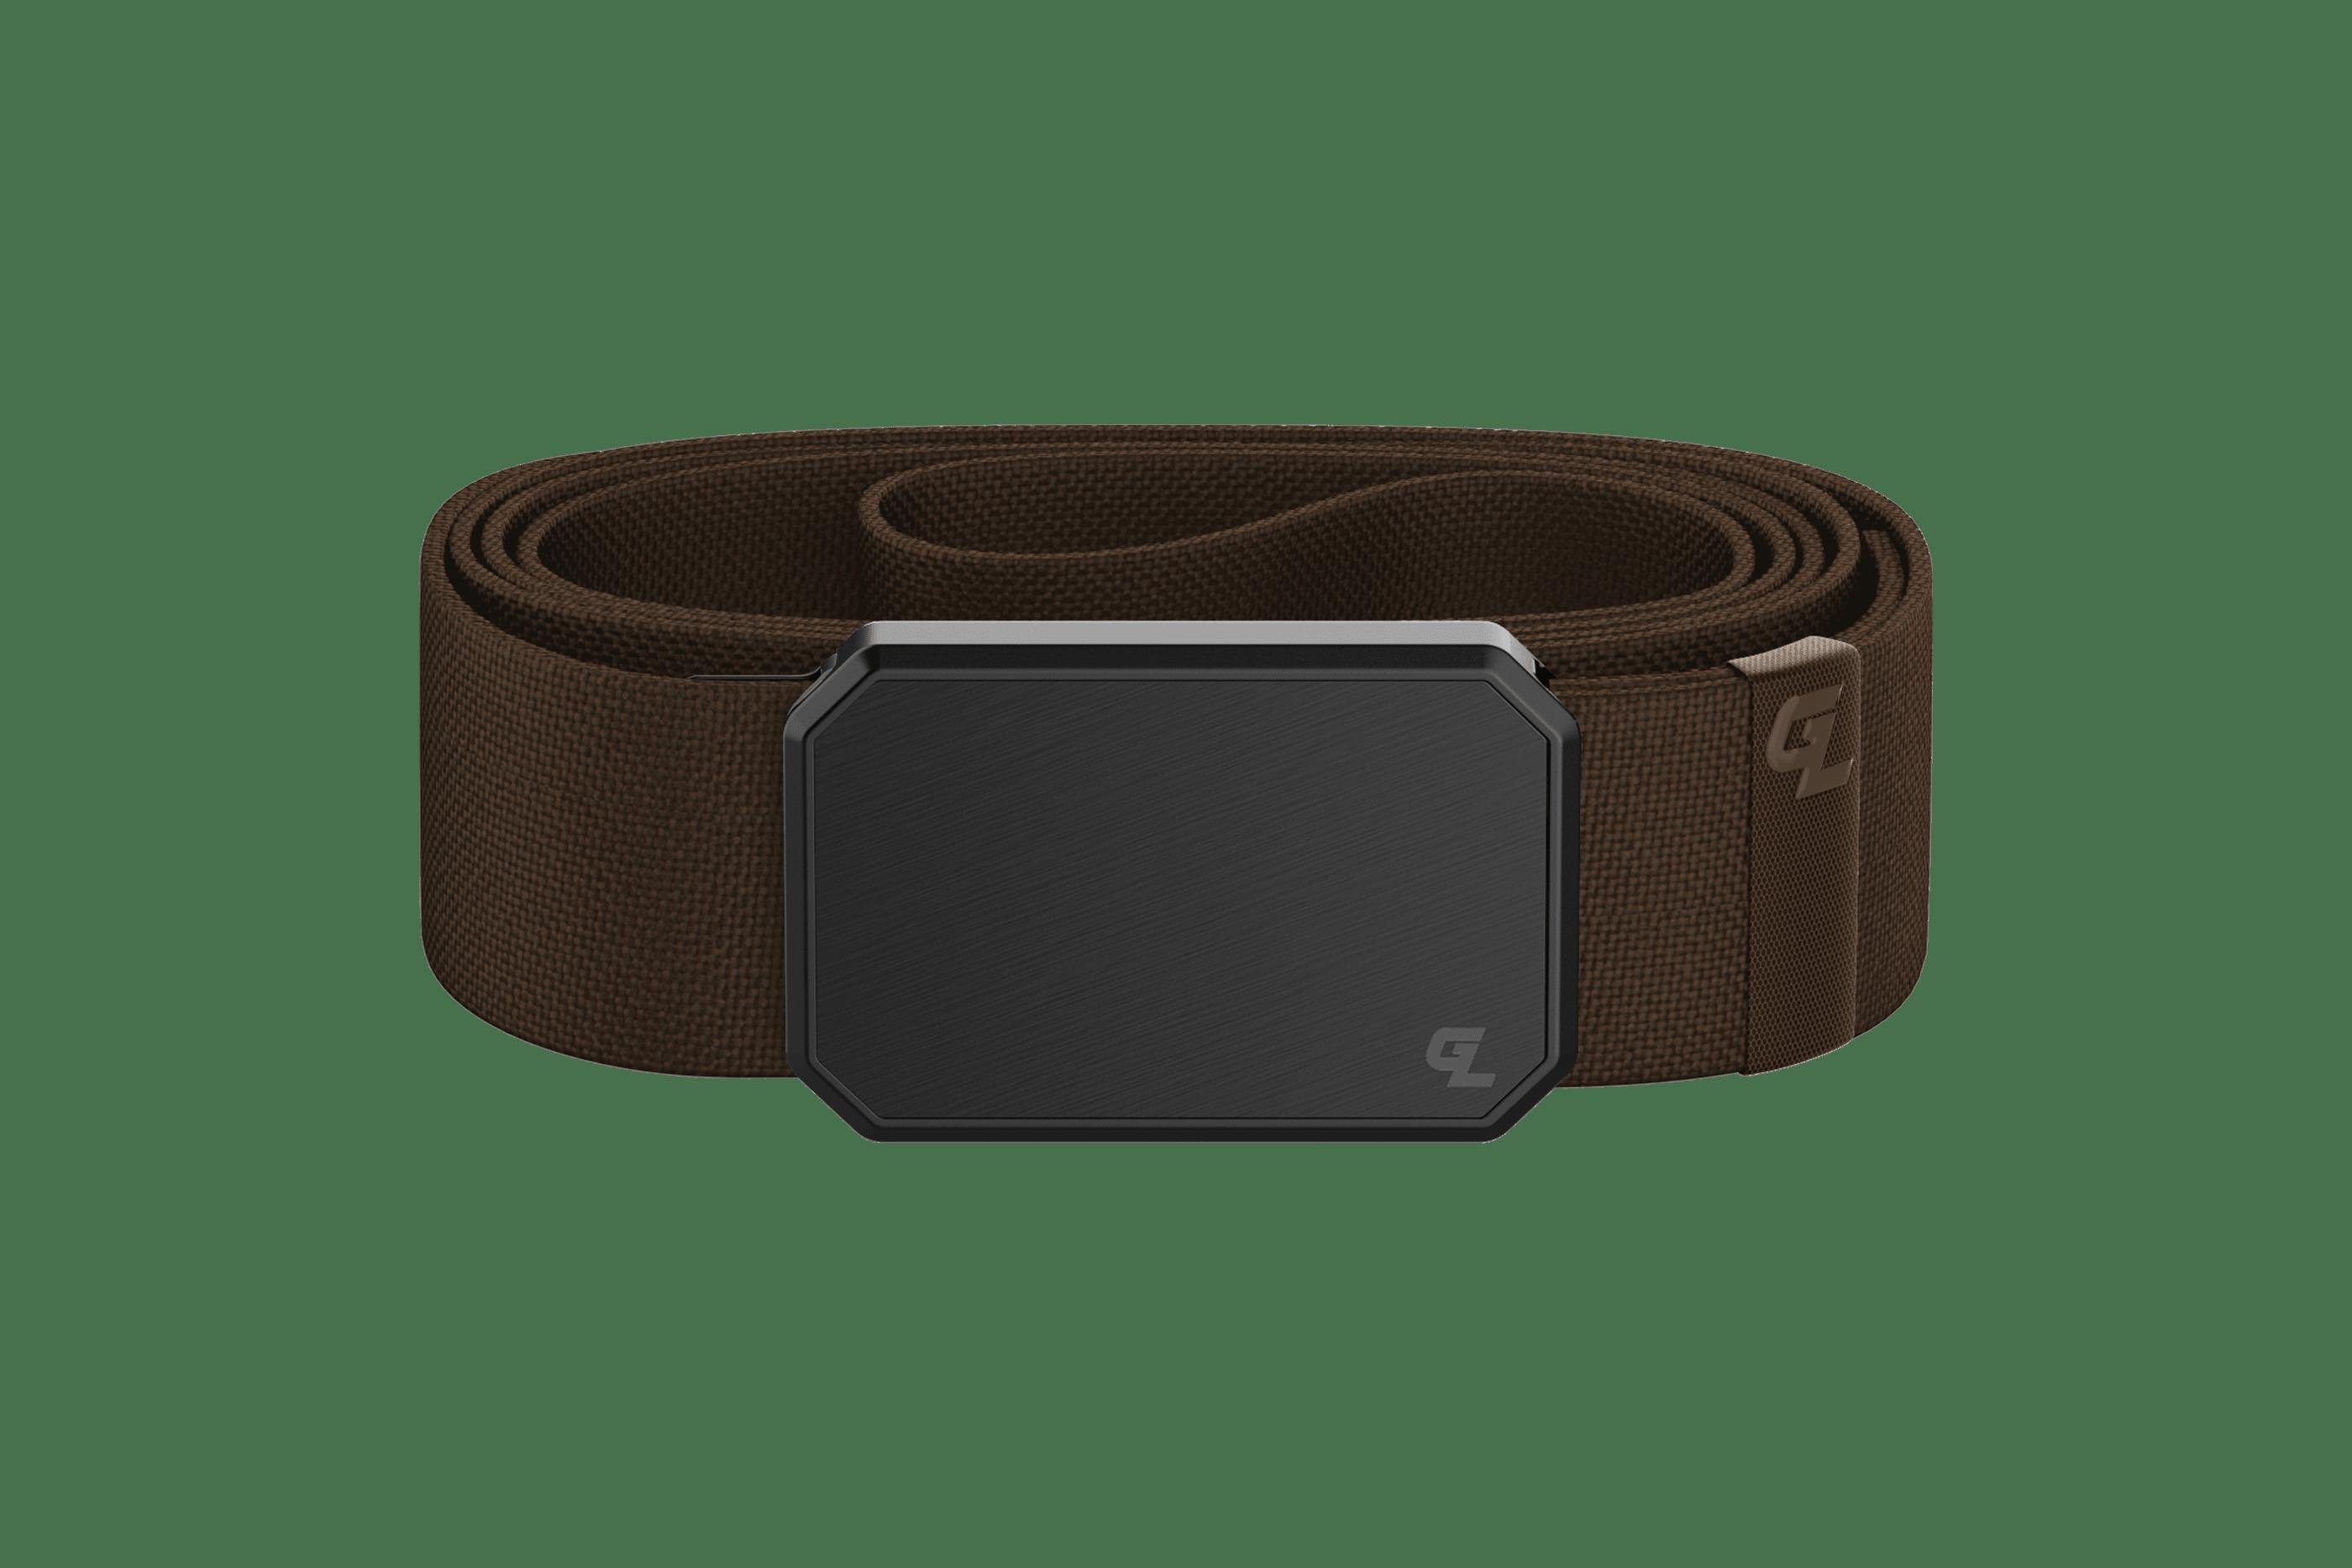 Groove Belt Black/Brown  viewed front on